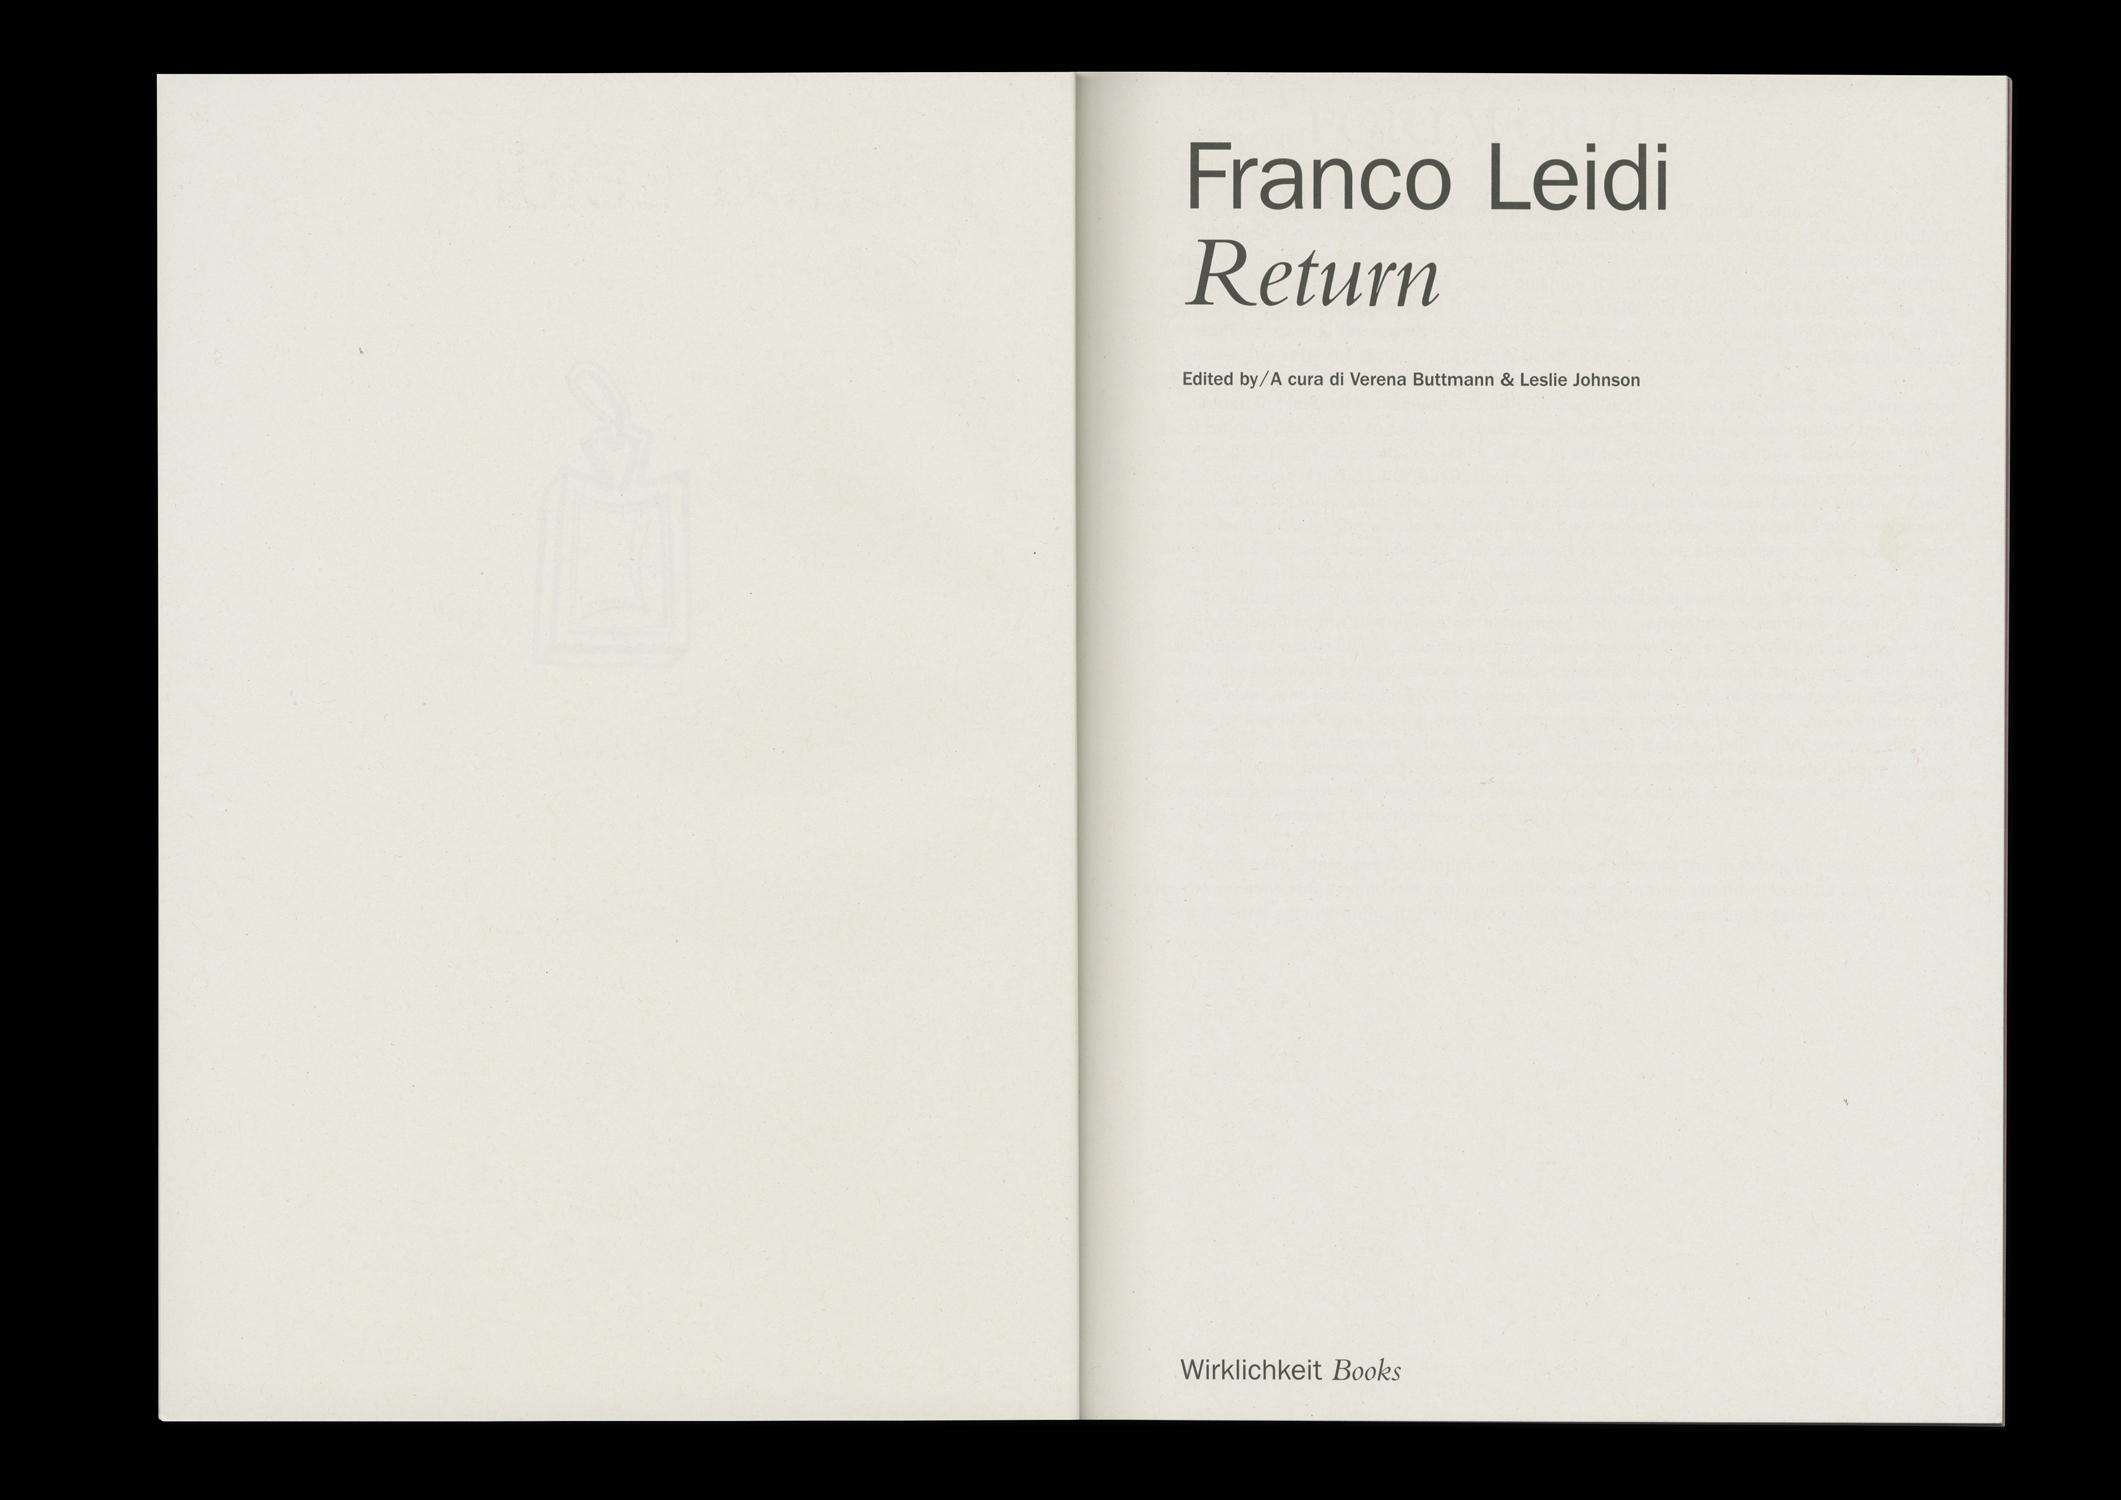 FRANCO_LEIDI_3